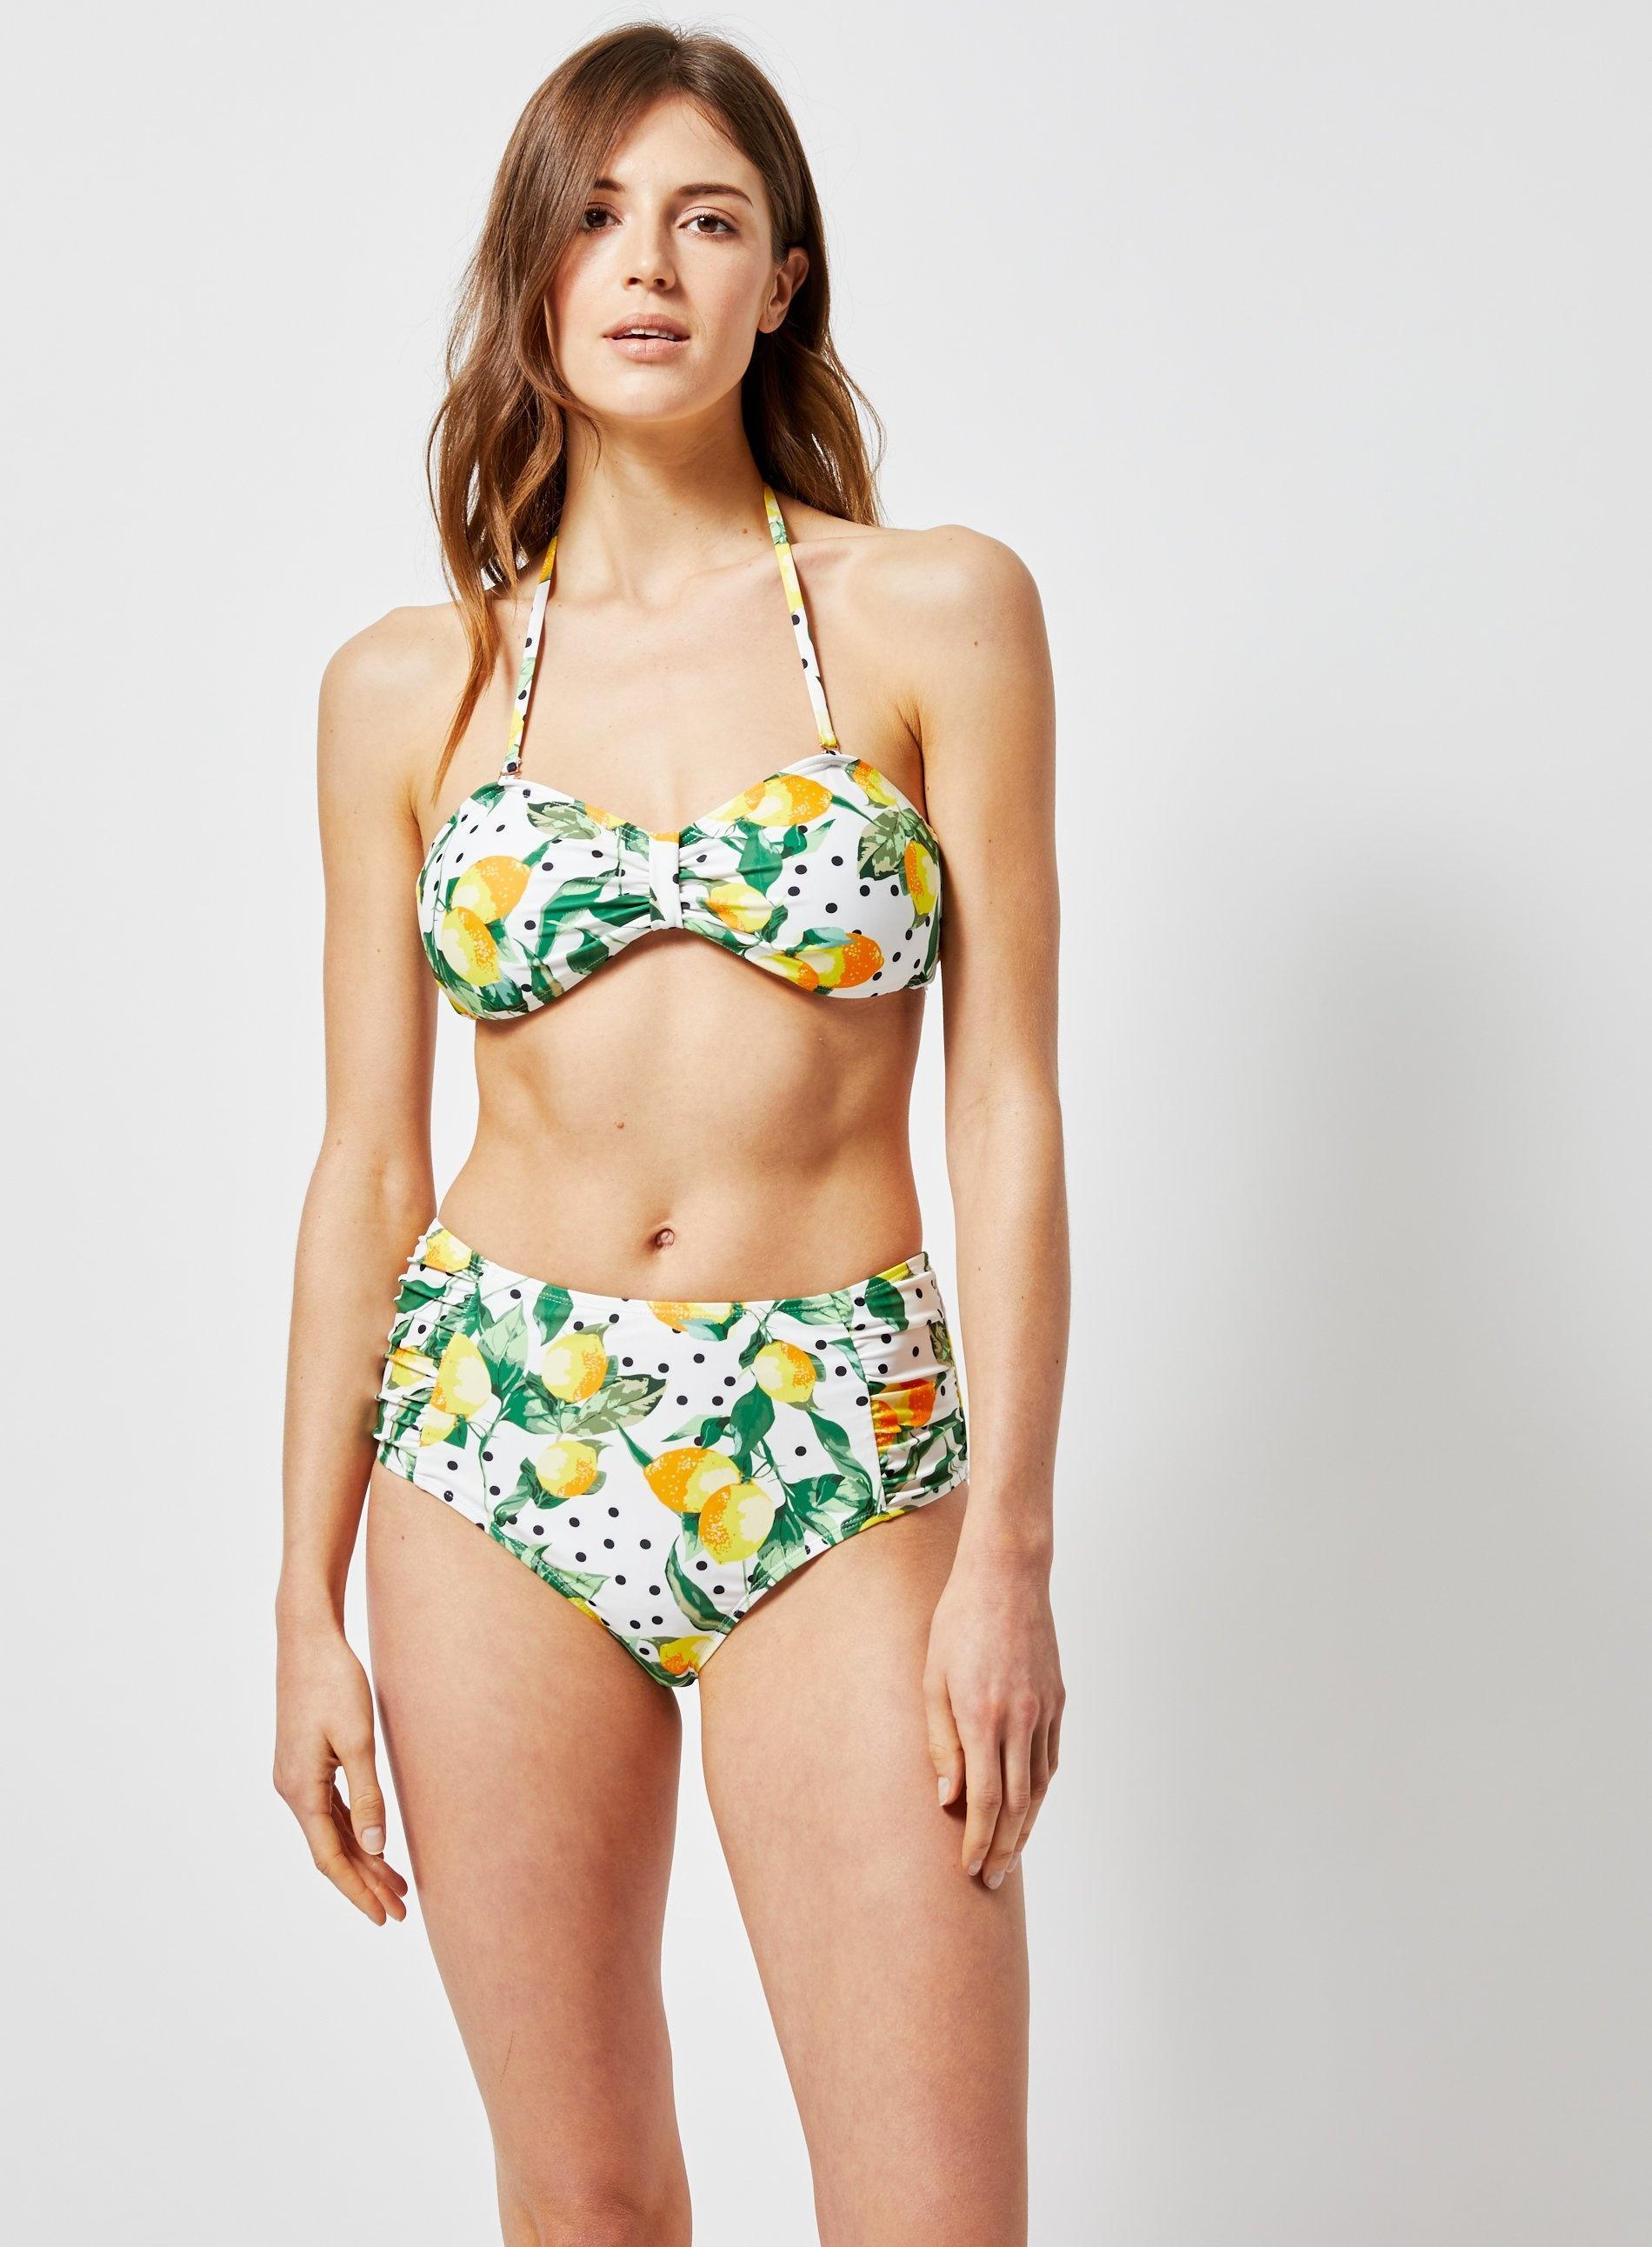 51f7705d234c5 ... Dp Beach White Lemon And Polka Dot Print Bikini Top - Lyst. View  fullscreen